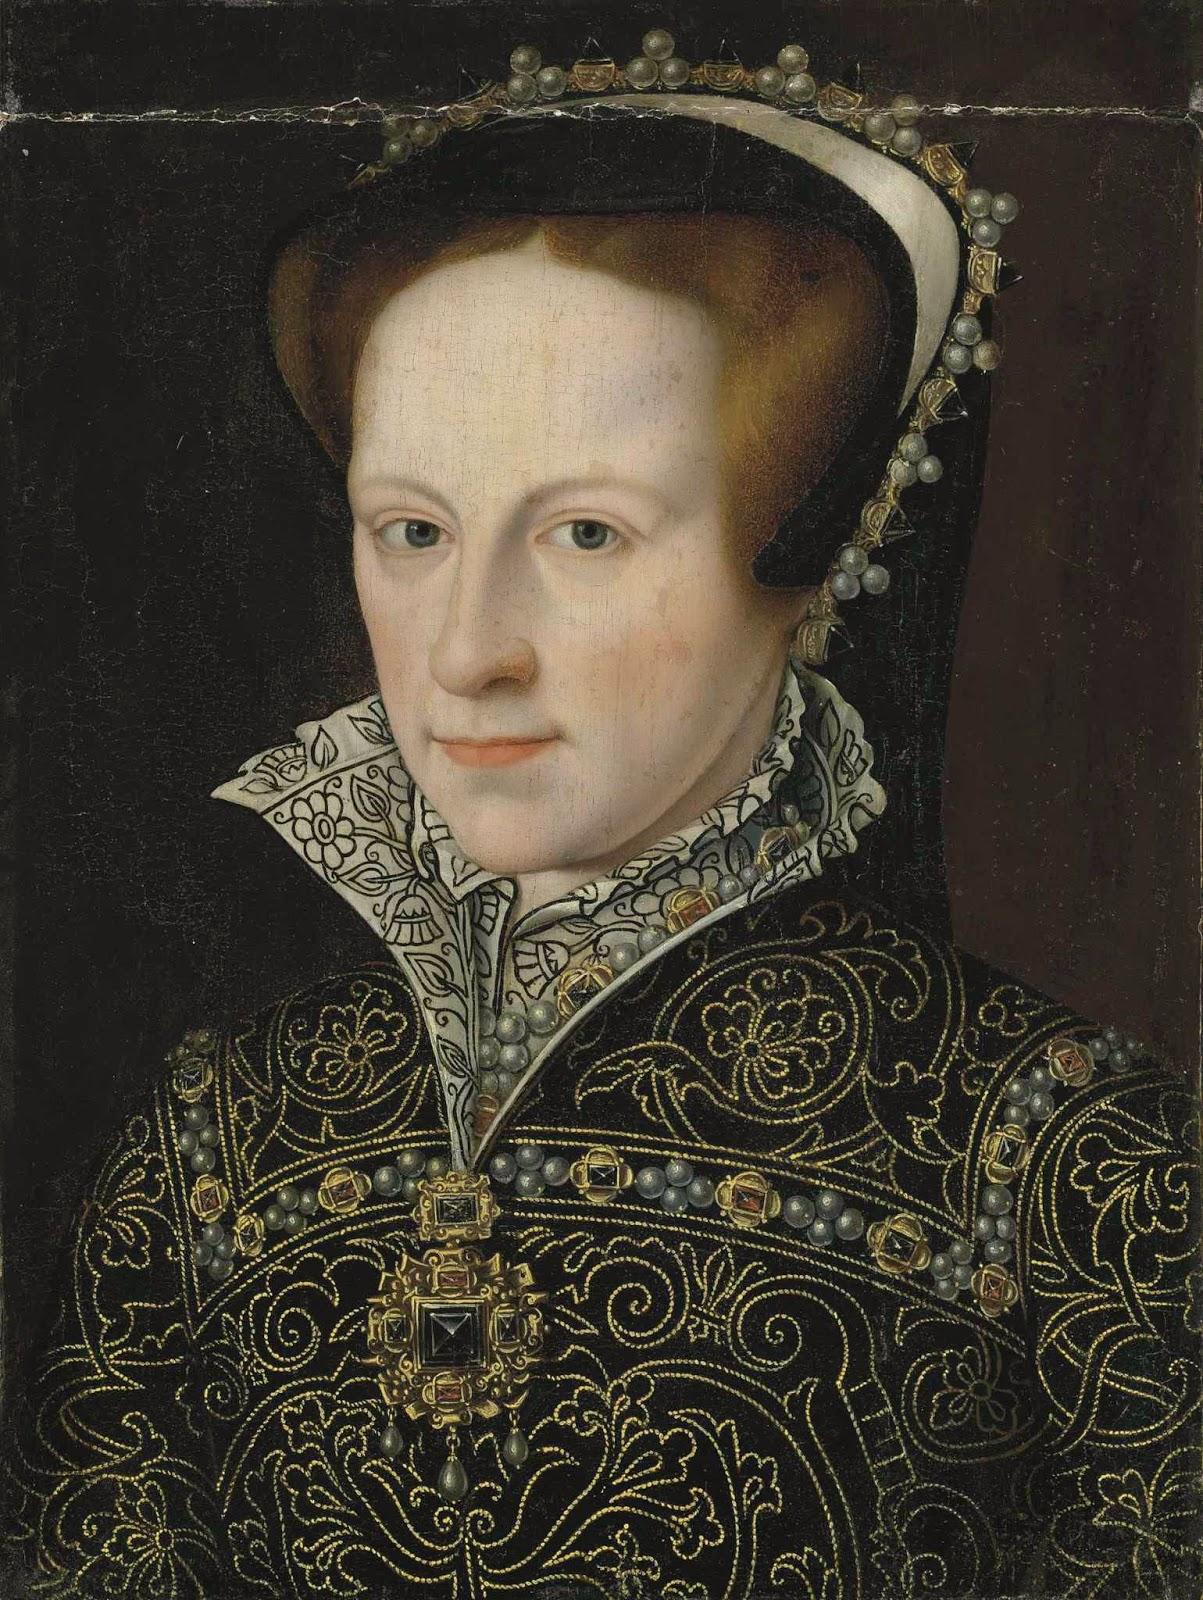 Ambito di Anthonis Mor, La regina Maria I Tudor, XVI sec. - after_antonio_mor